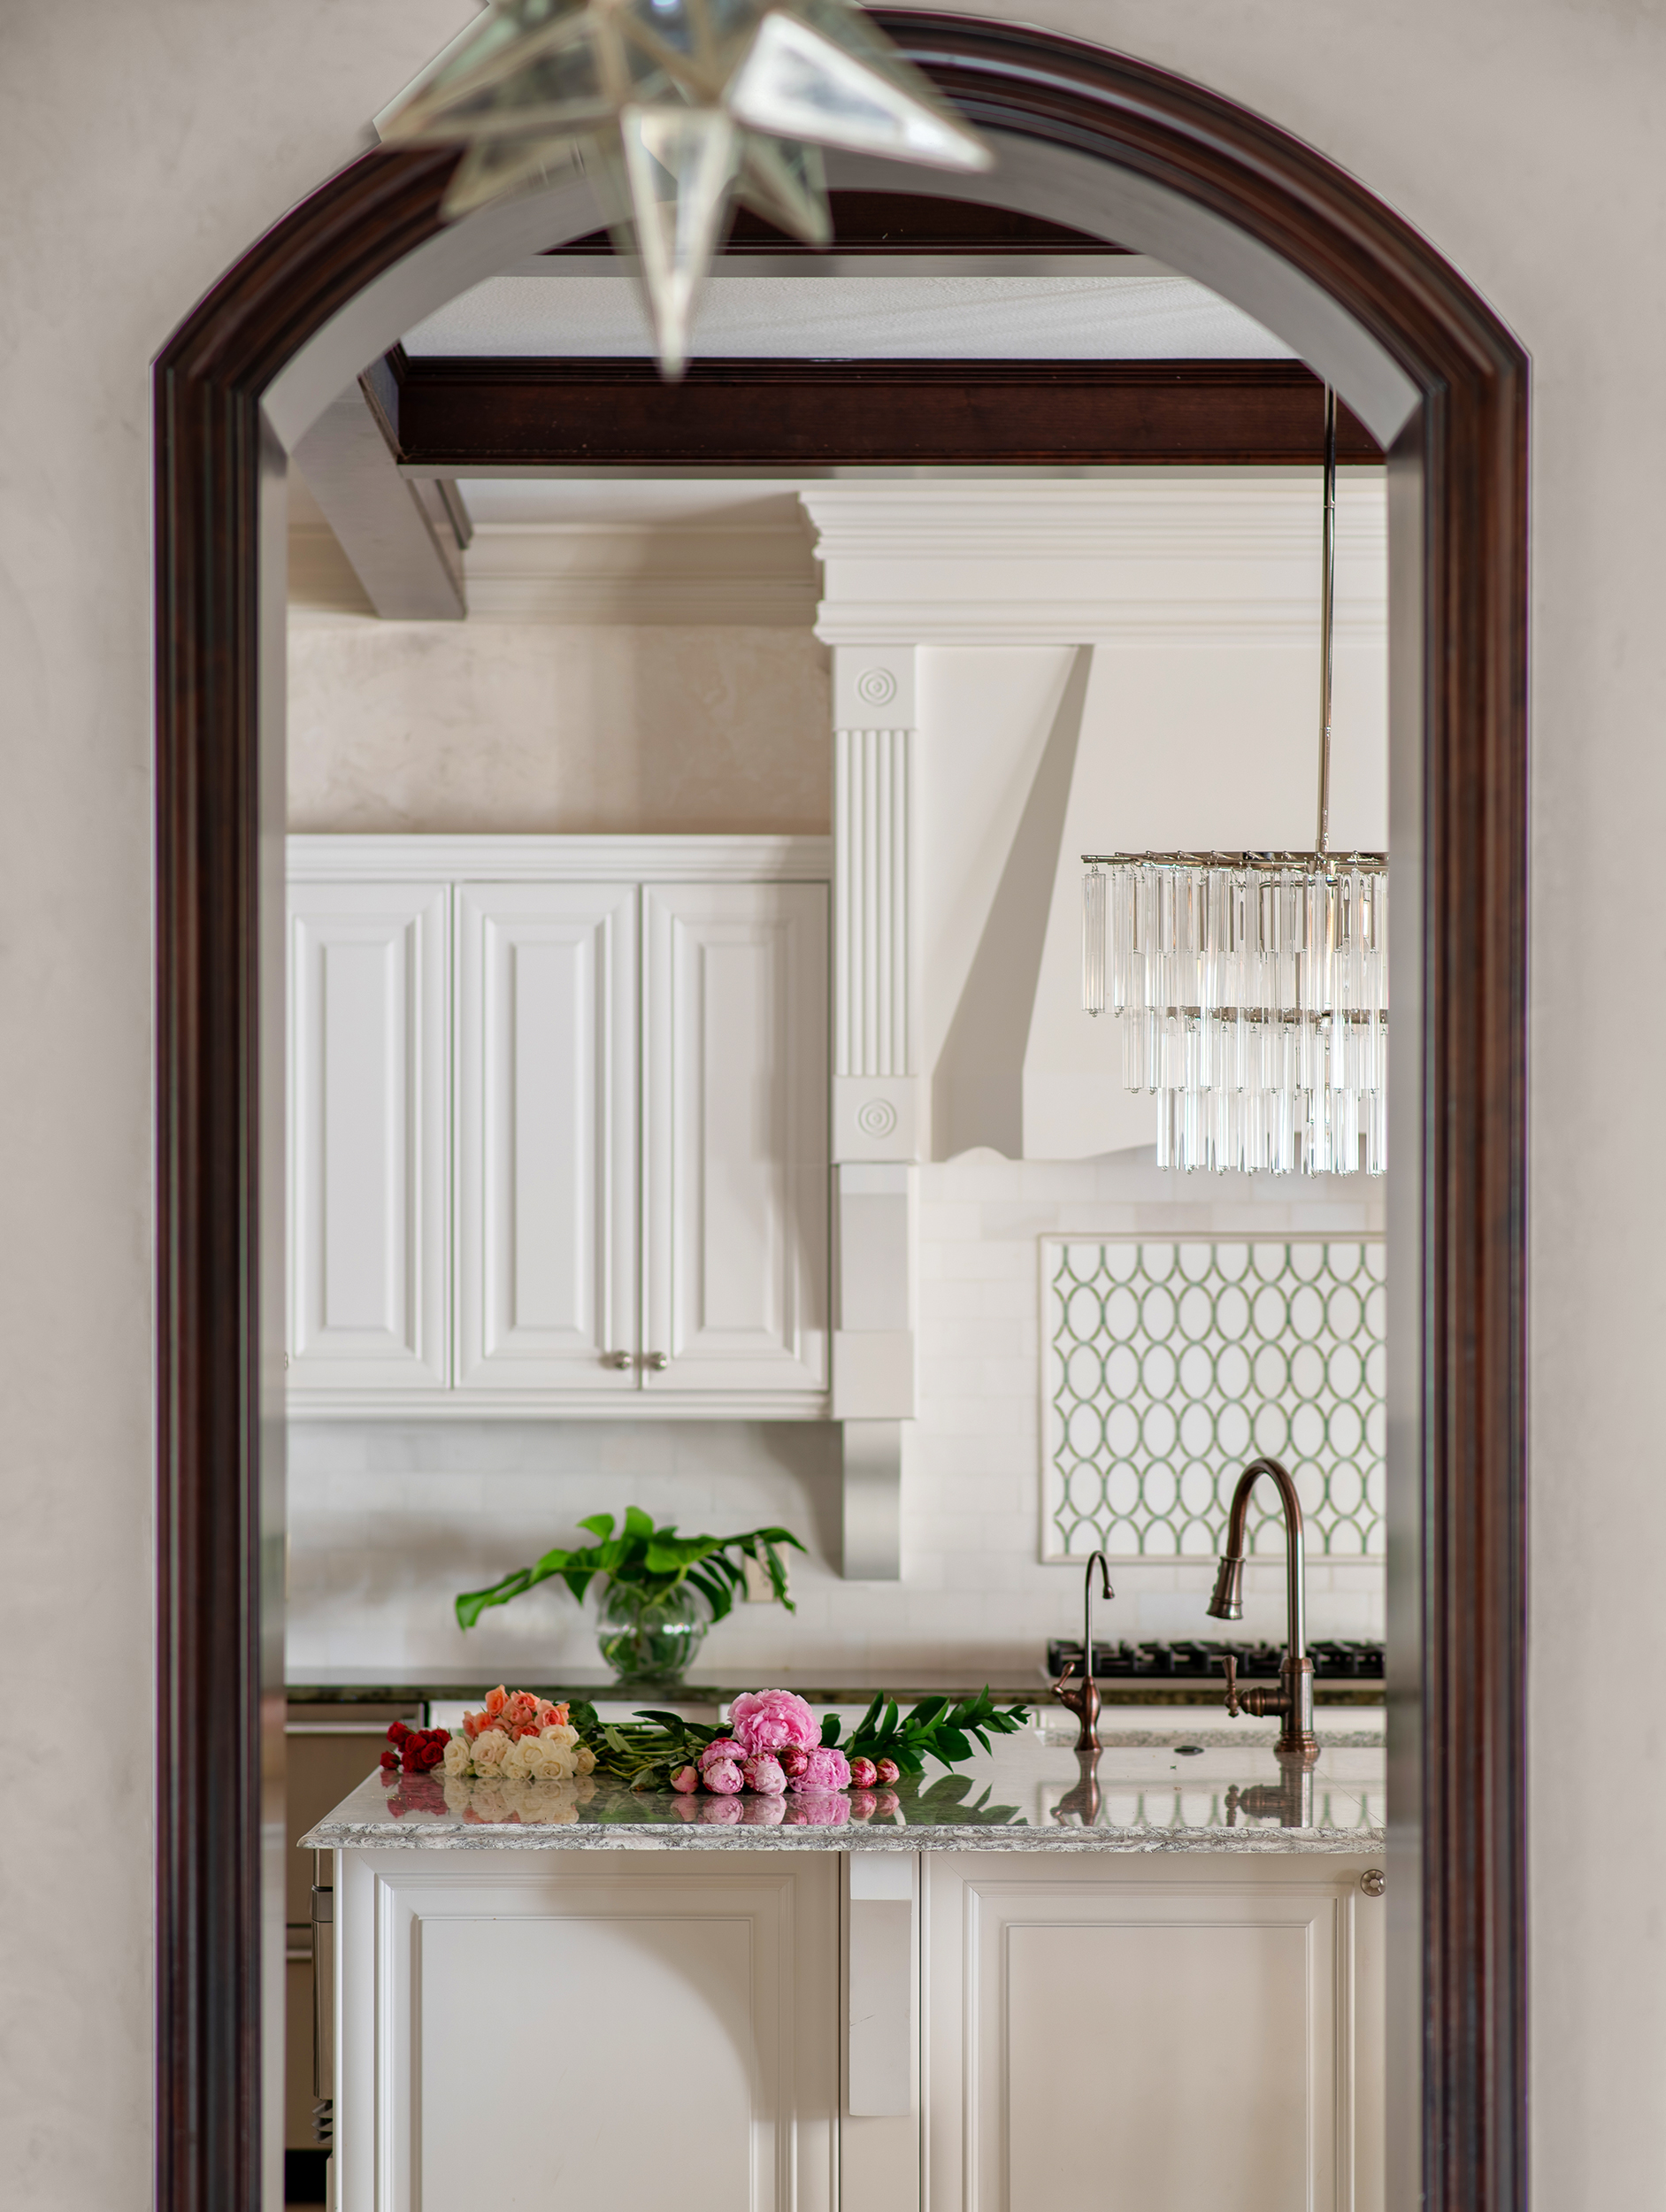 kylie-ponton---martinique---kitchen-framed-by-hall-crop---round-two.jpeg